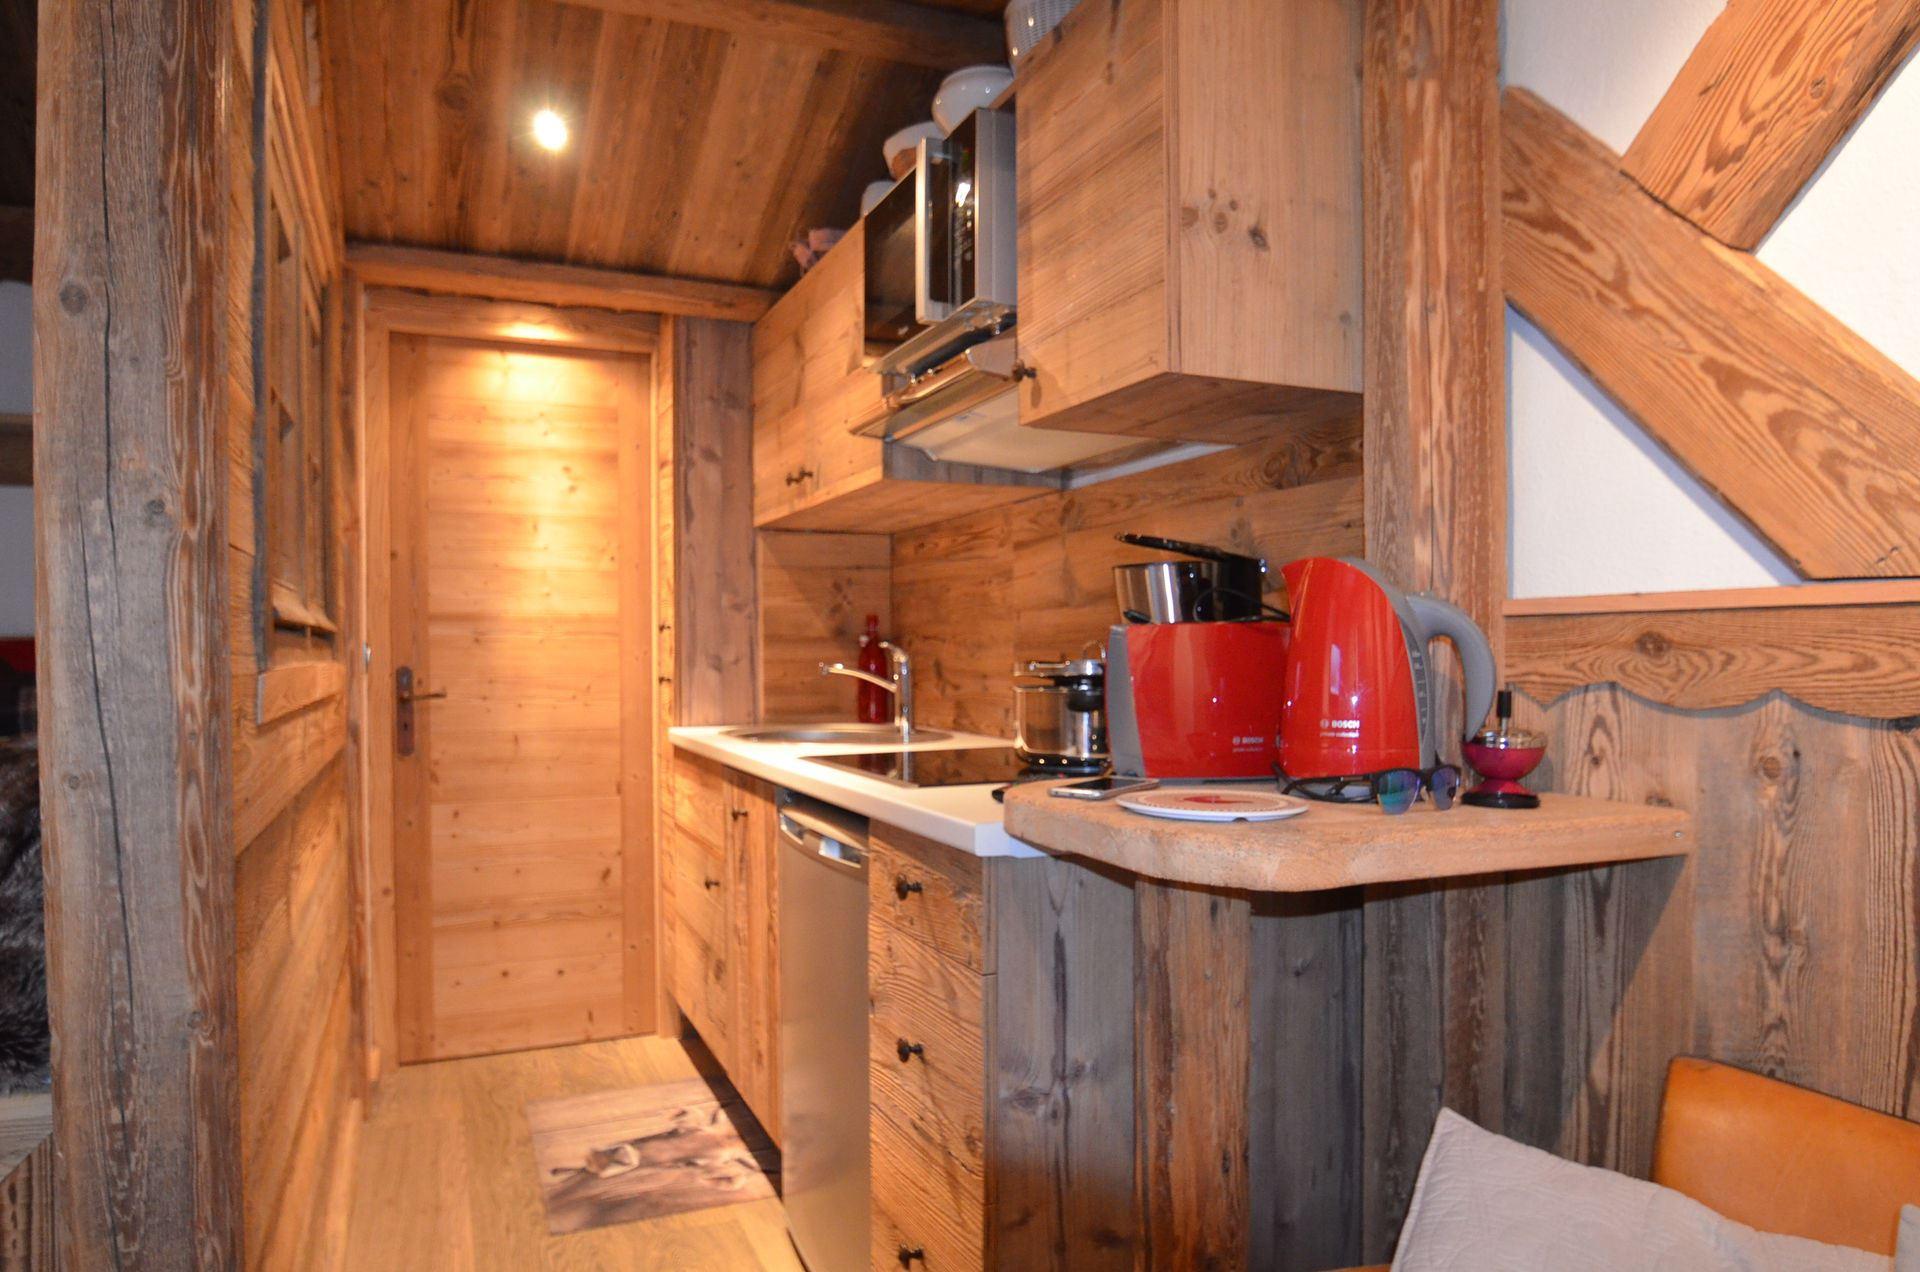 3 Pers studio ski-in ski-out / NECOU 717